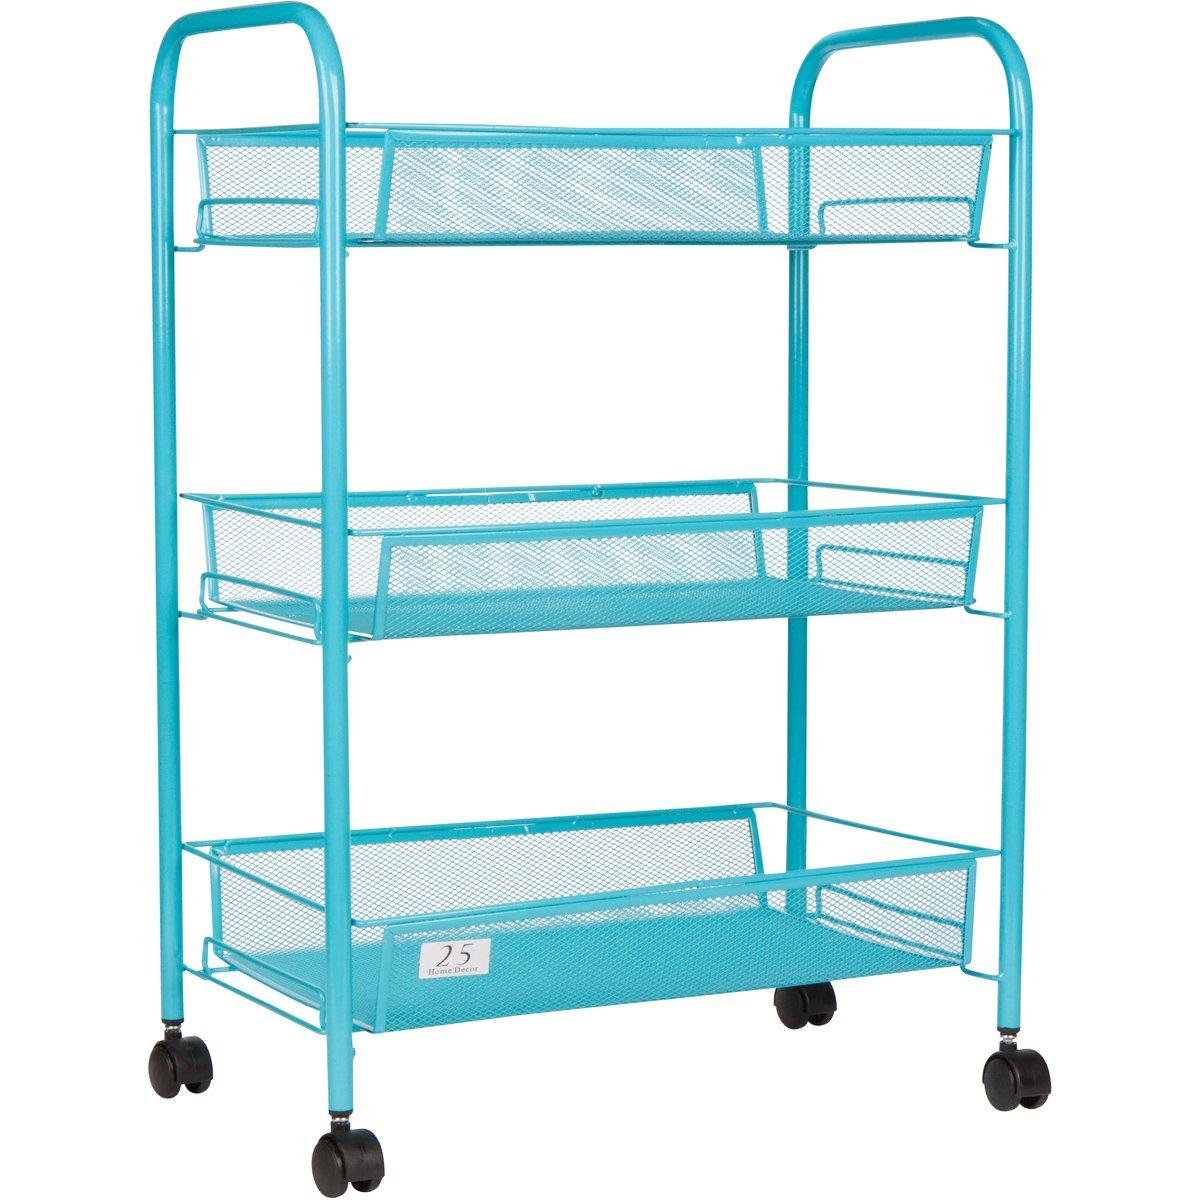 Amazon.com : 3 Tier Utility Cart, Kitchen Storage with Rolling Wheel ...